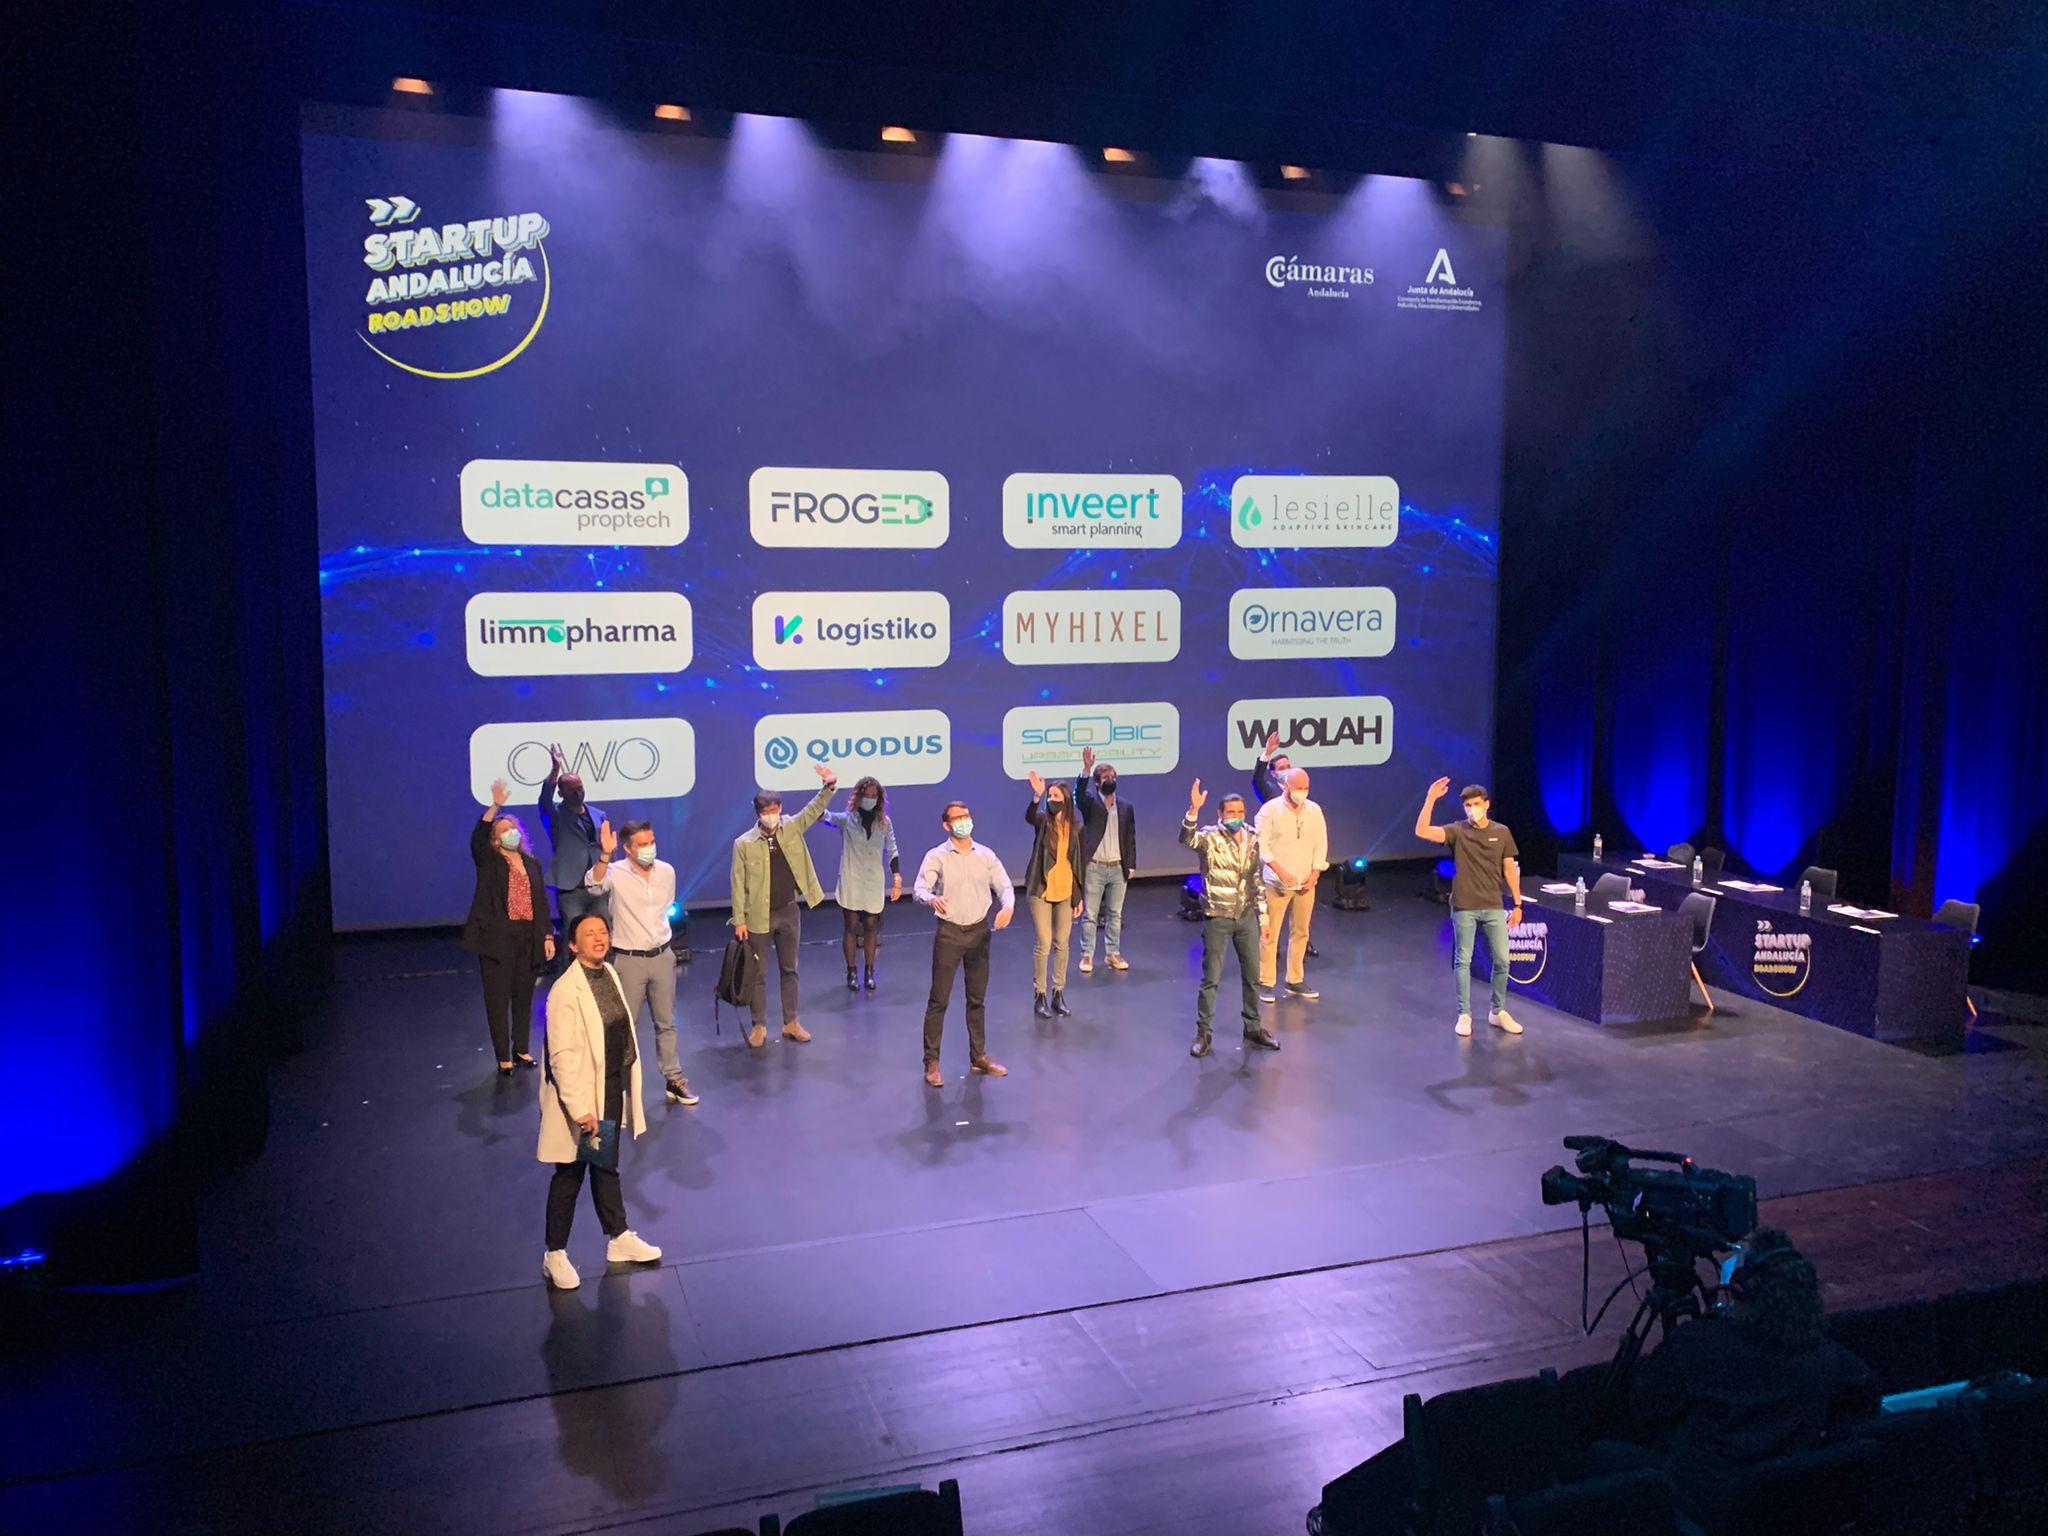 Limnopharma, Myhixeles, Owo Game, Scoobic y Wuolah, ganadoras de Startup Andalucía Roadshow